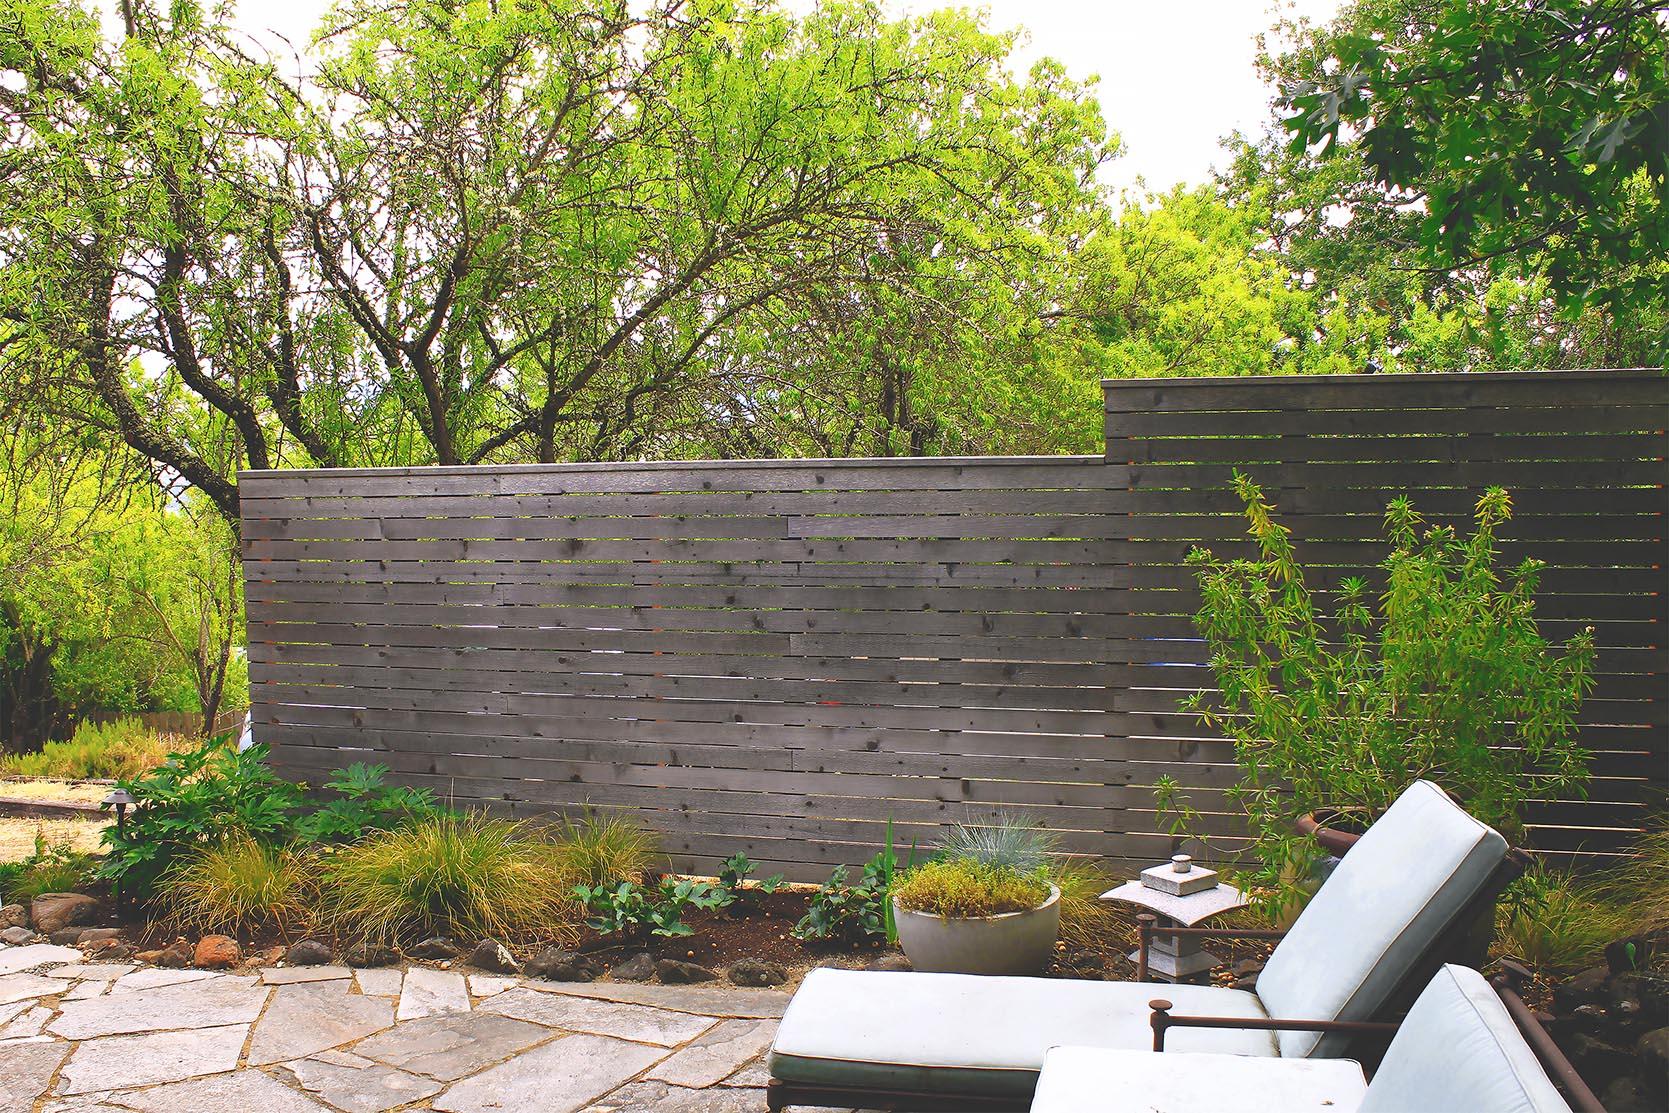 Flagstone Patio + Path + Timber + Gravel Steps + Horizontal Cedar Slat Privacy Fence + Deer-Resistant Perennial Garden + Modern + Seating Area